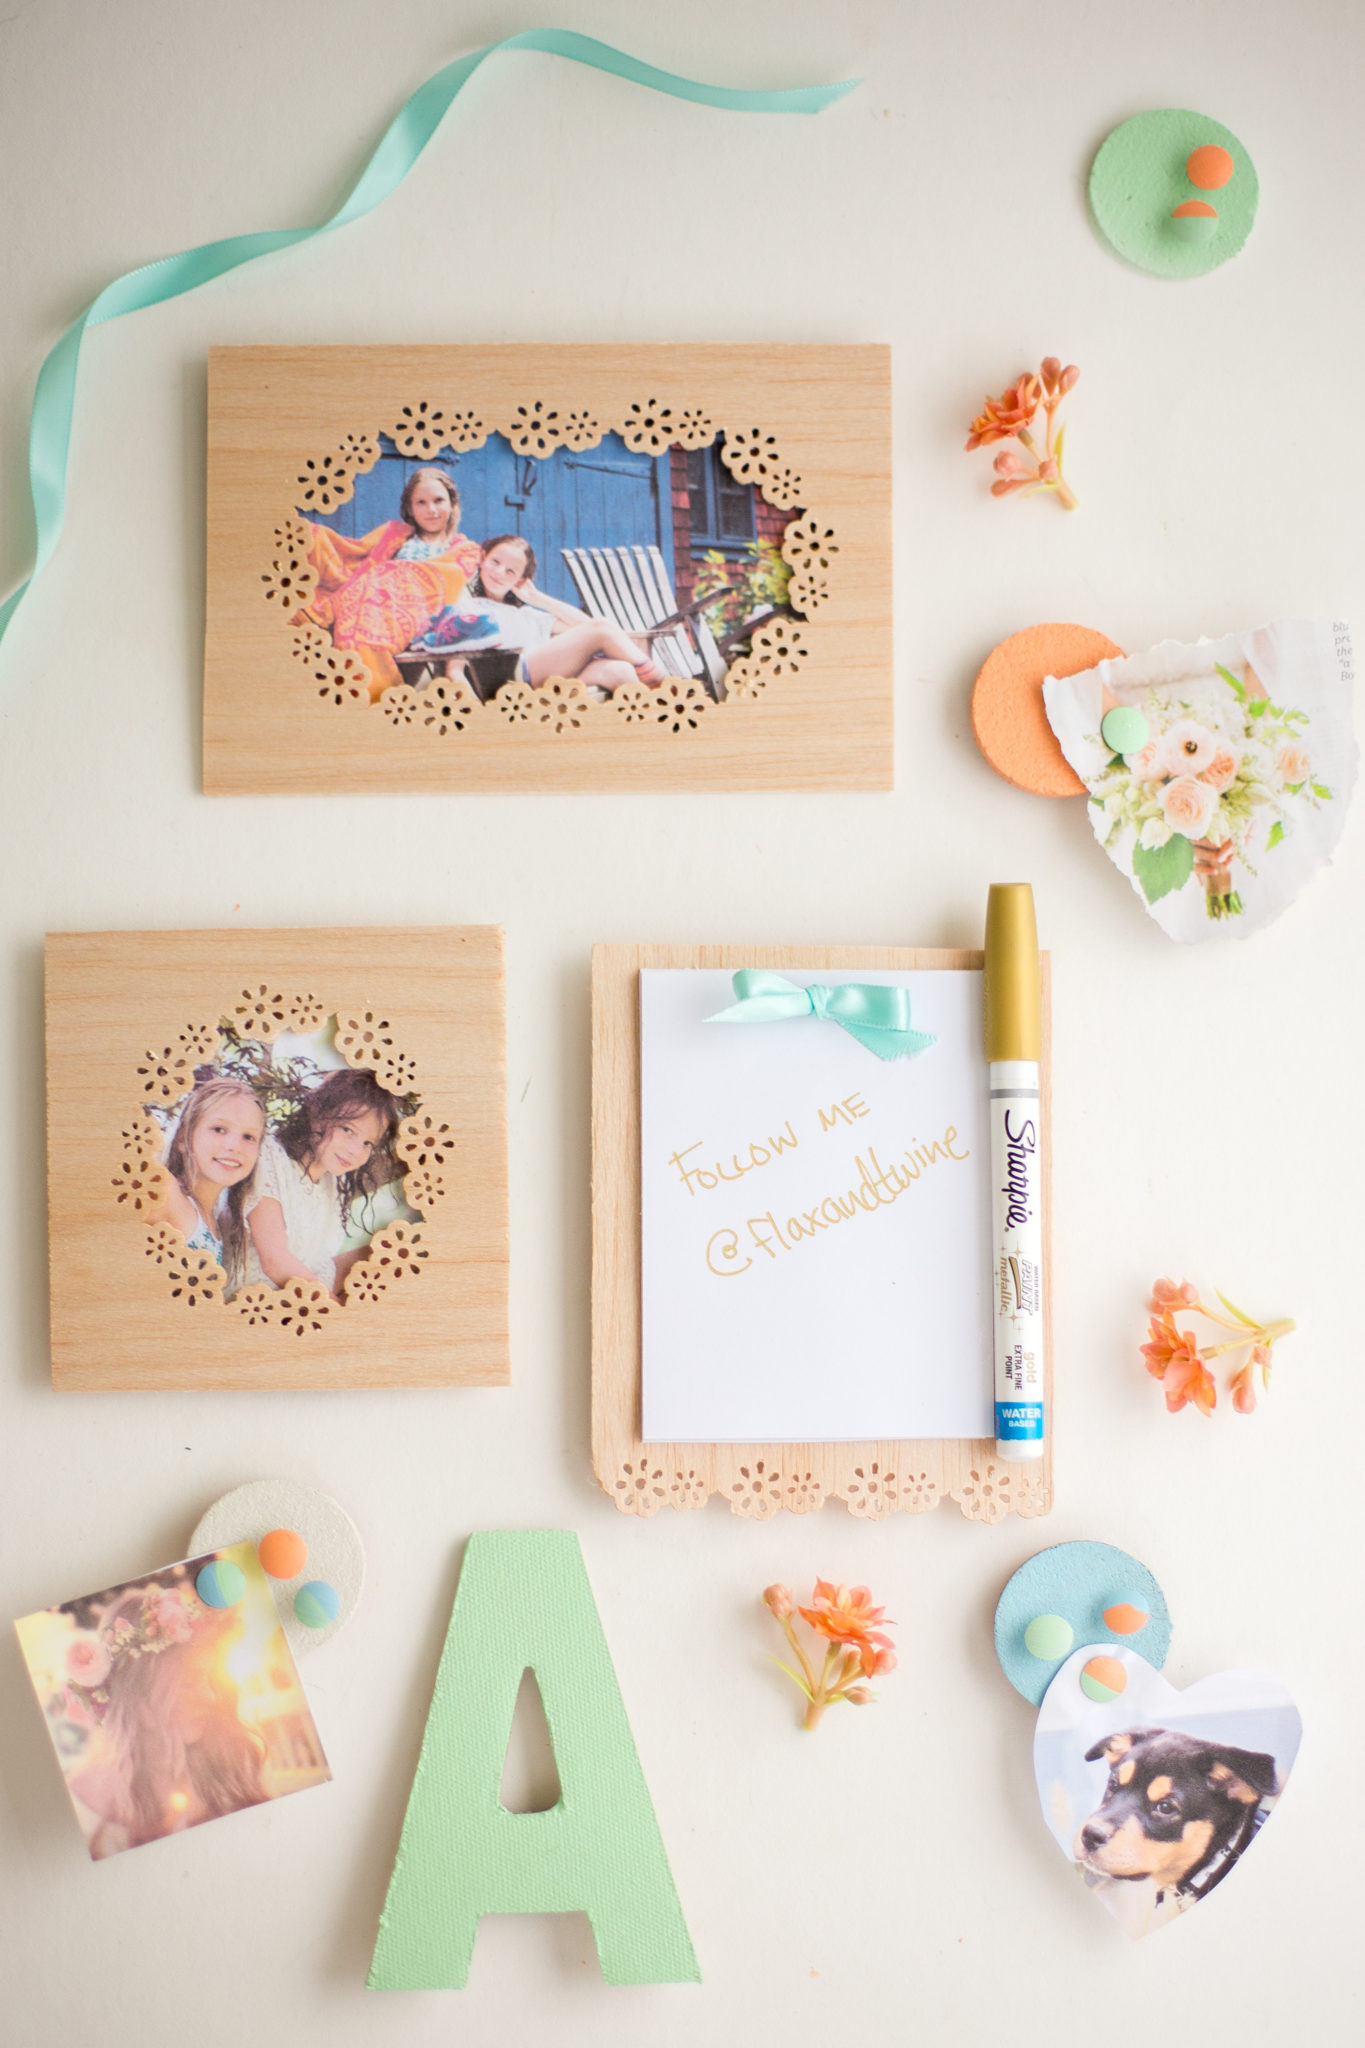 DIY Locker Decorations: Wooden Frames + Notepad - Flax & Twine